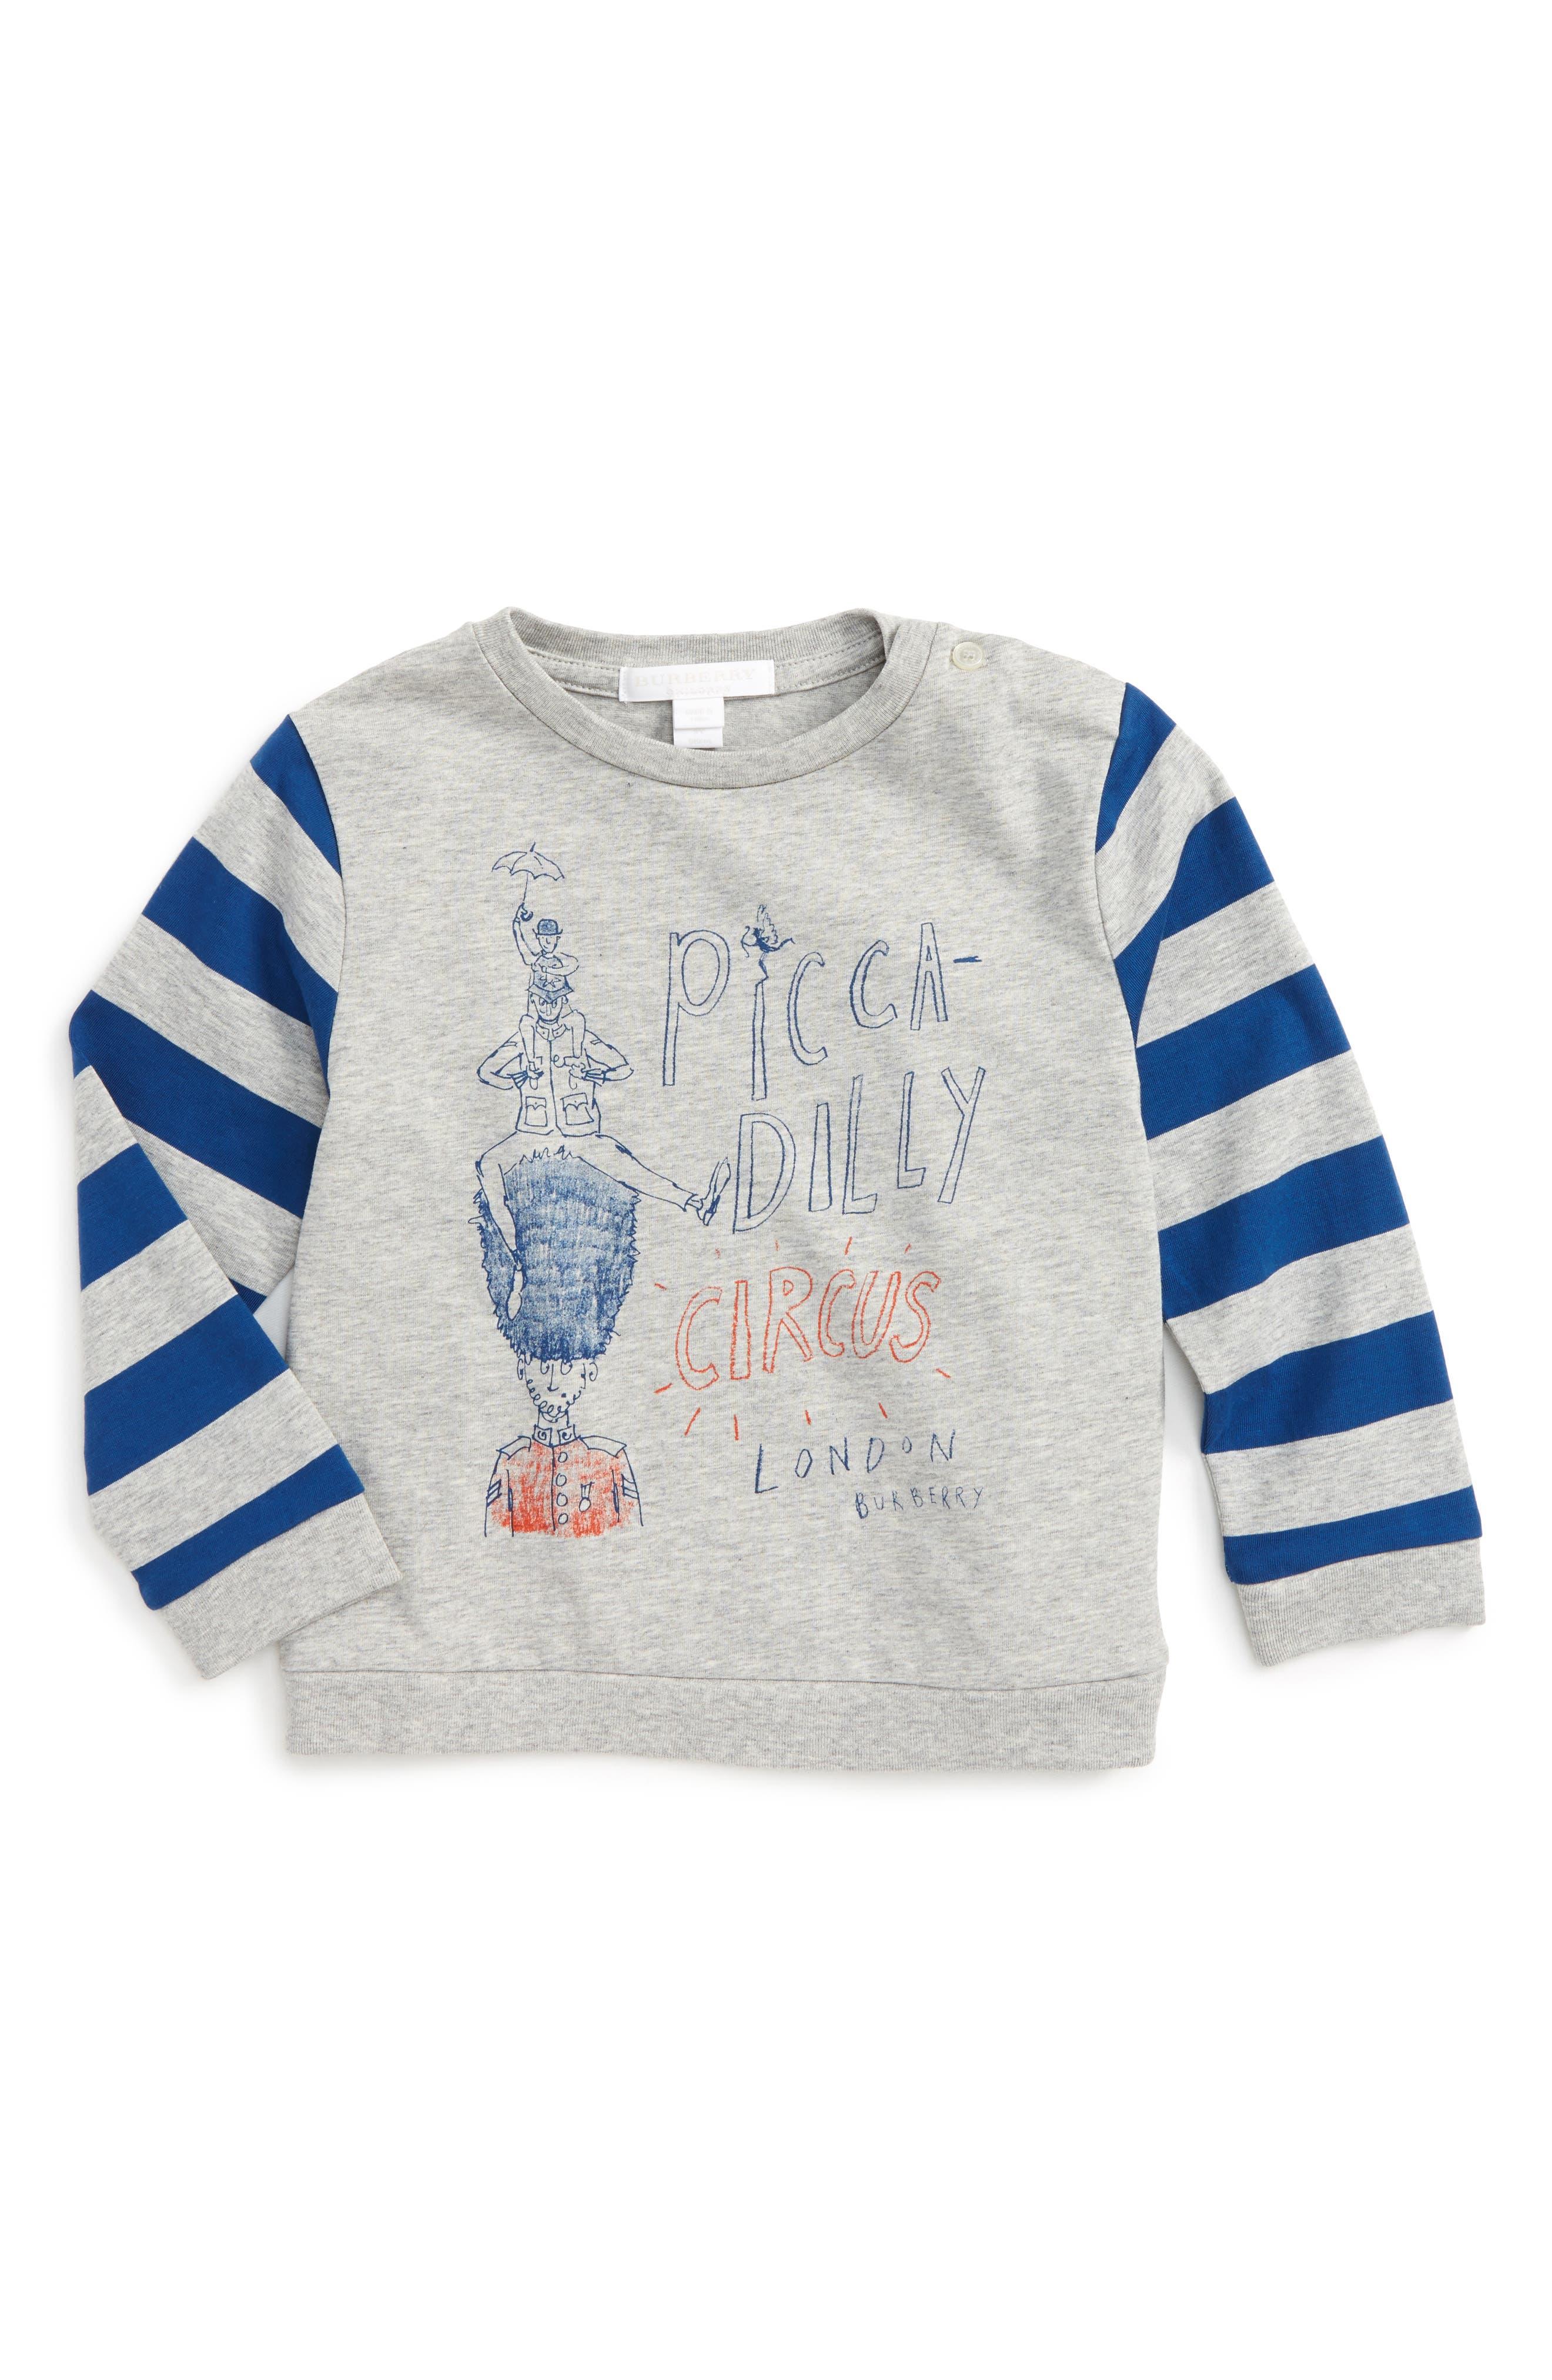 Oliver Graphic Sweatshirt,                             Main thumbnail 1, color,                             Navy/ Grey